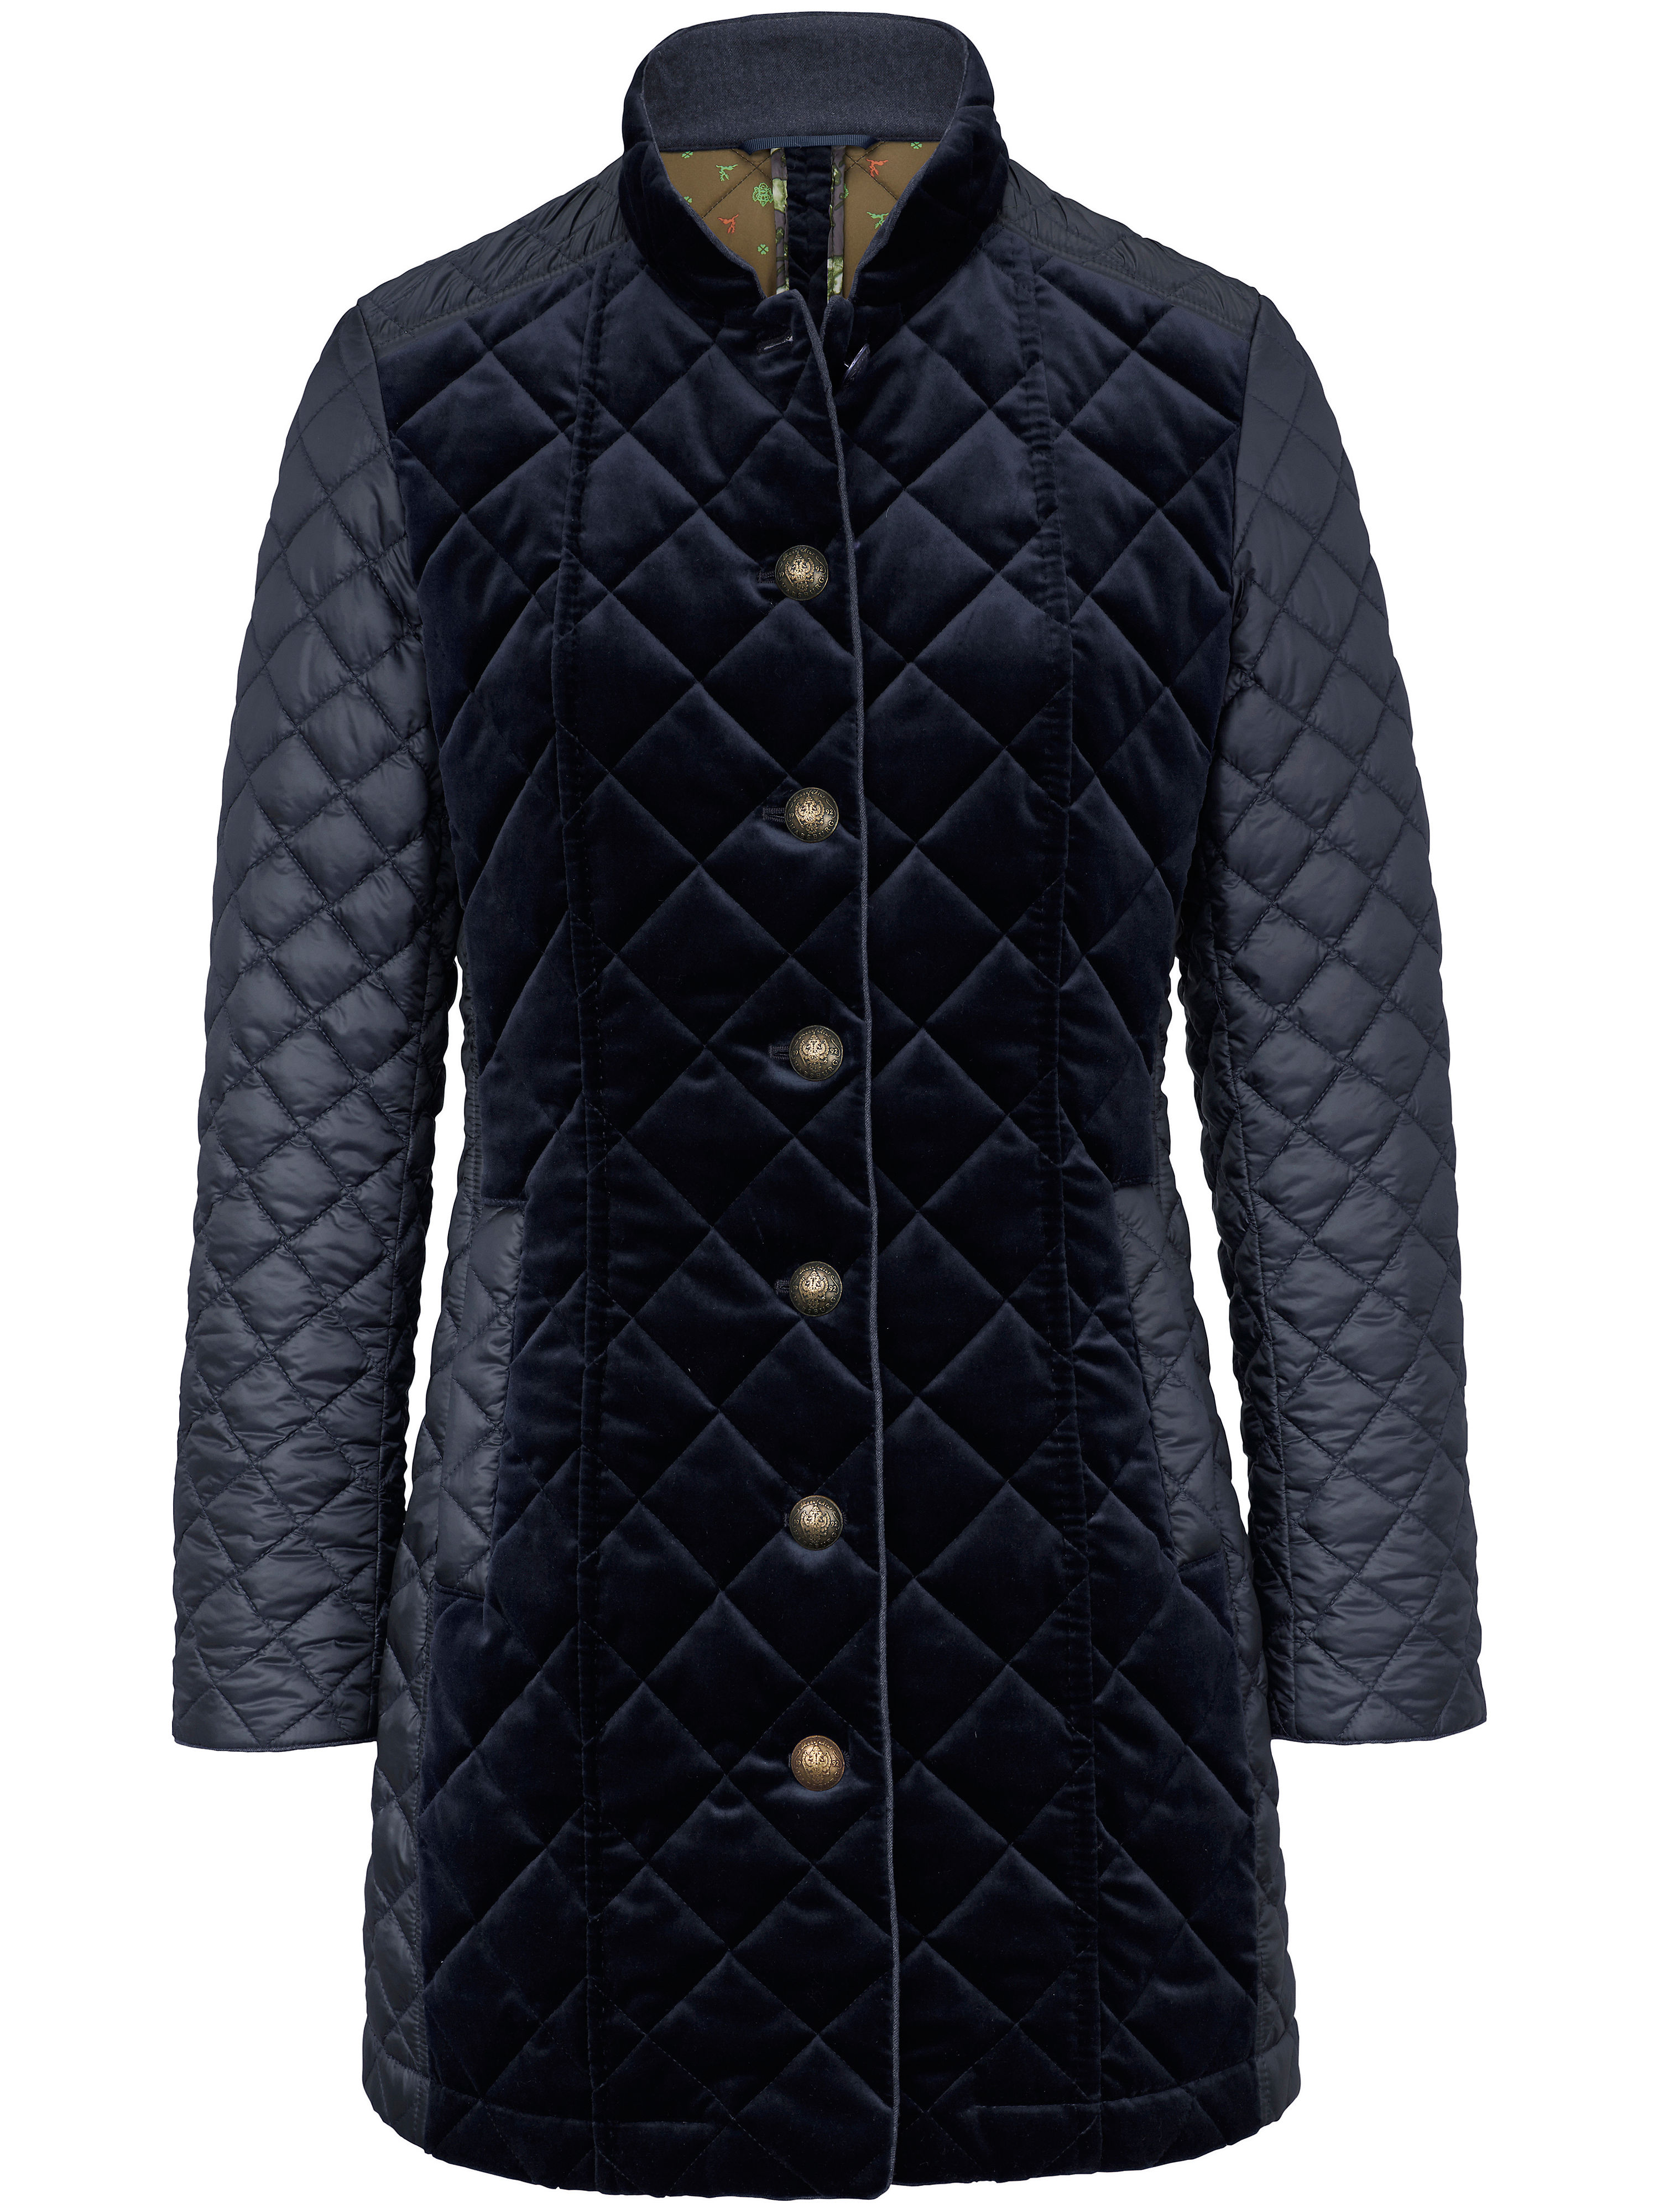 La veste  HABSBURG bleu taille 42